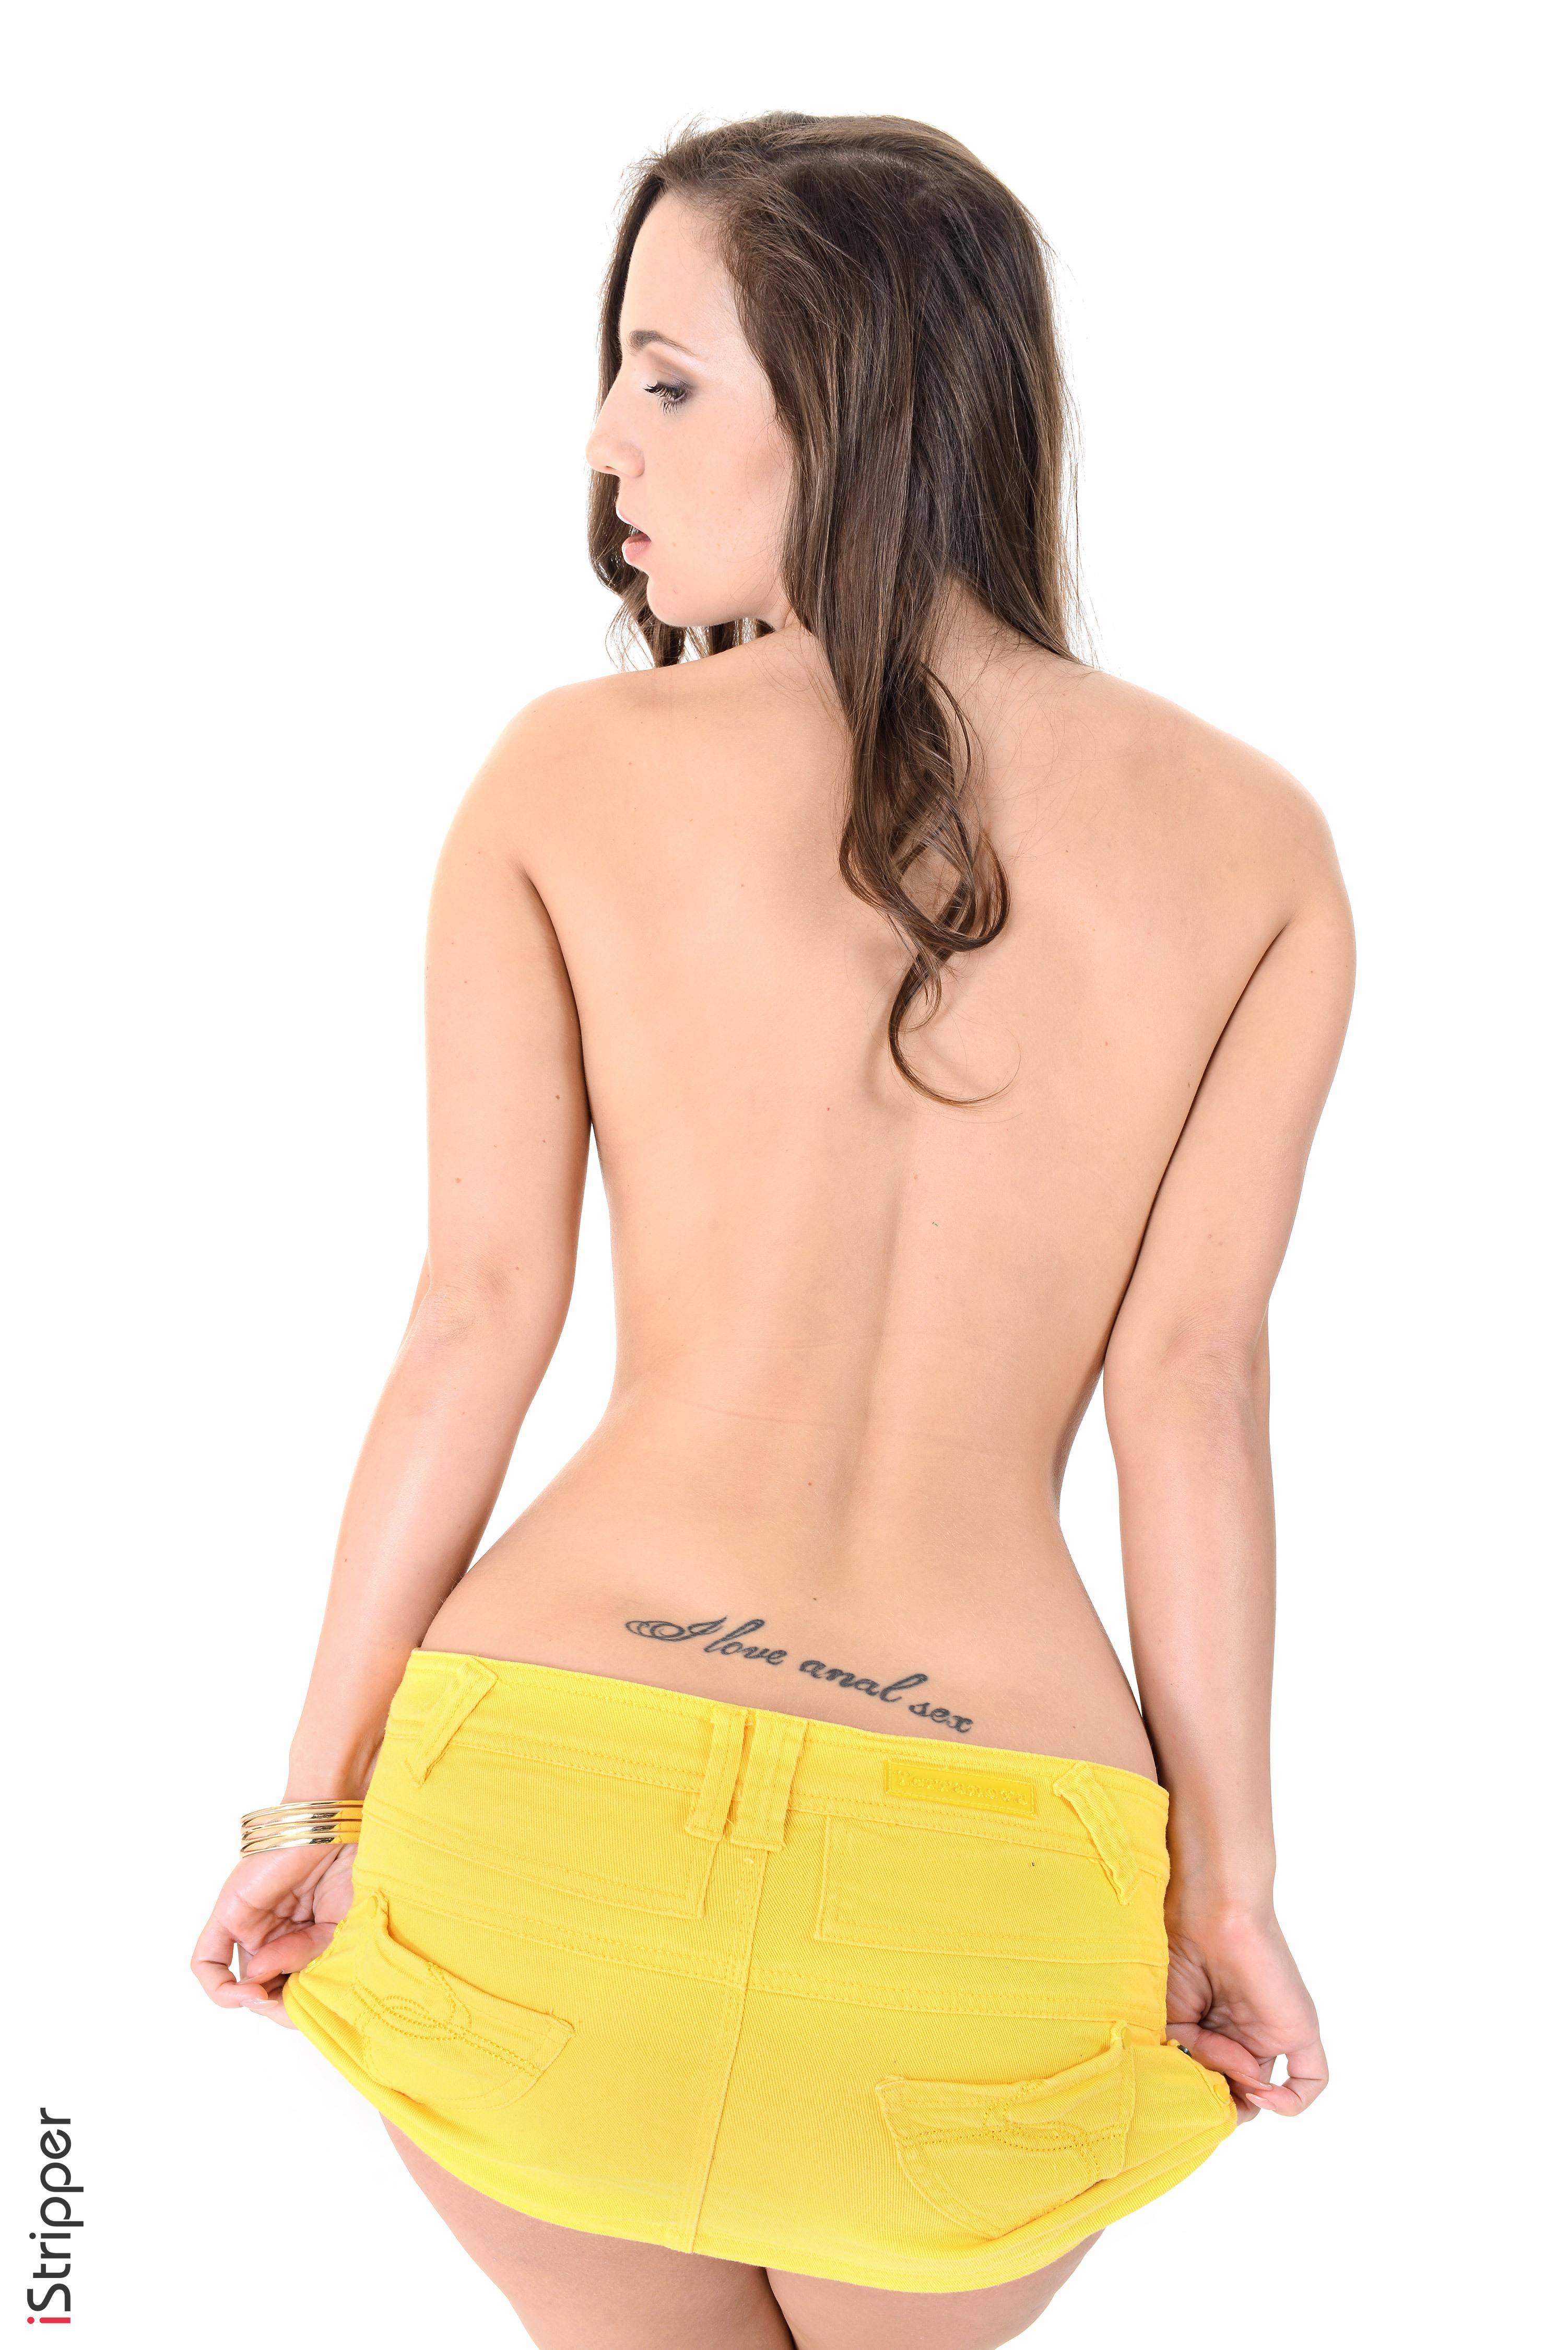 erotic valkyrie woman wallpaper